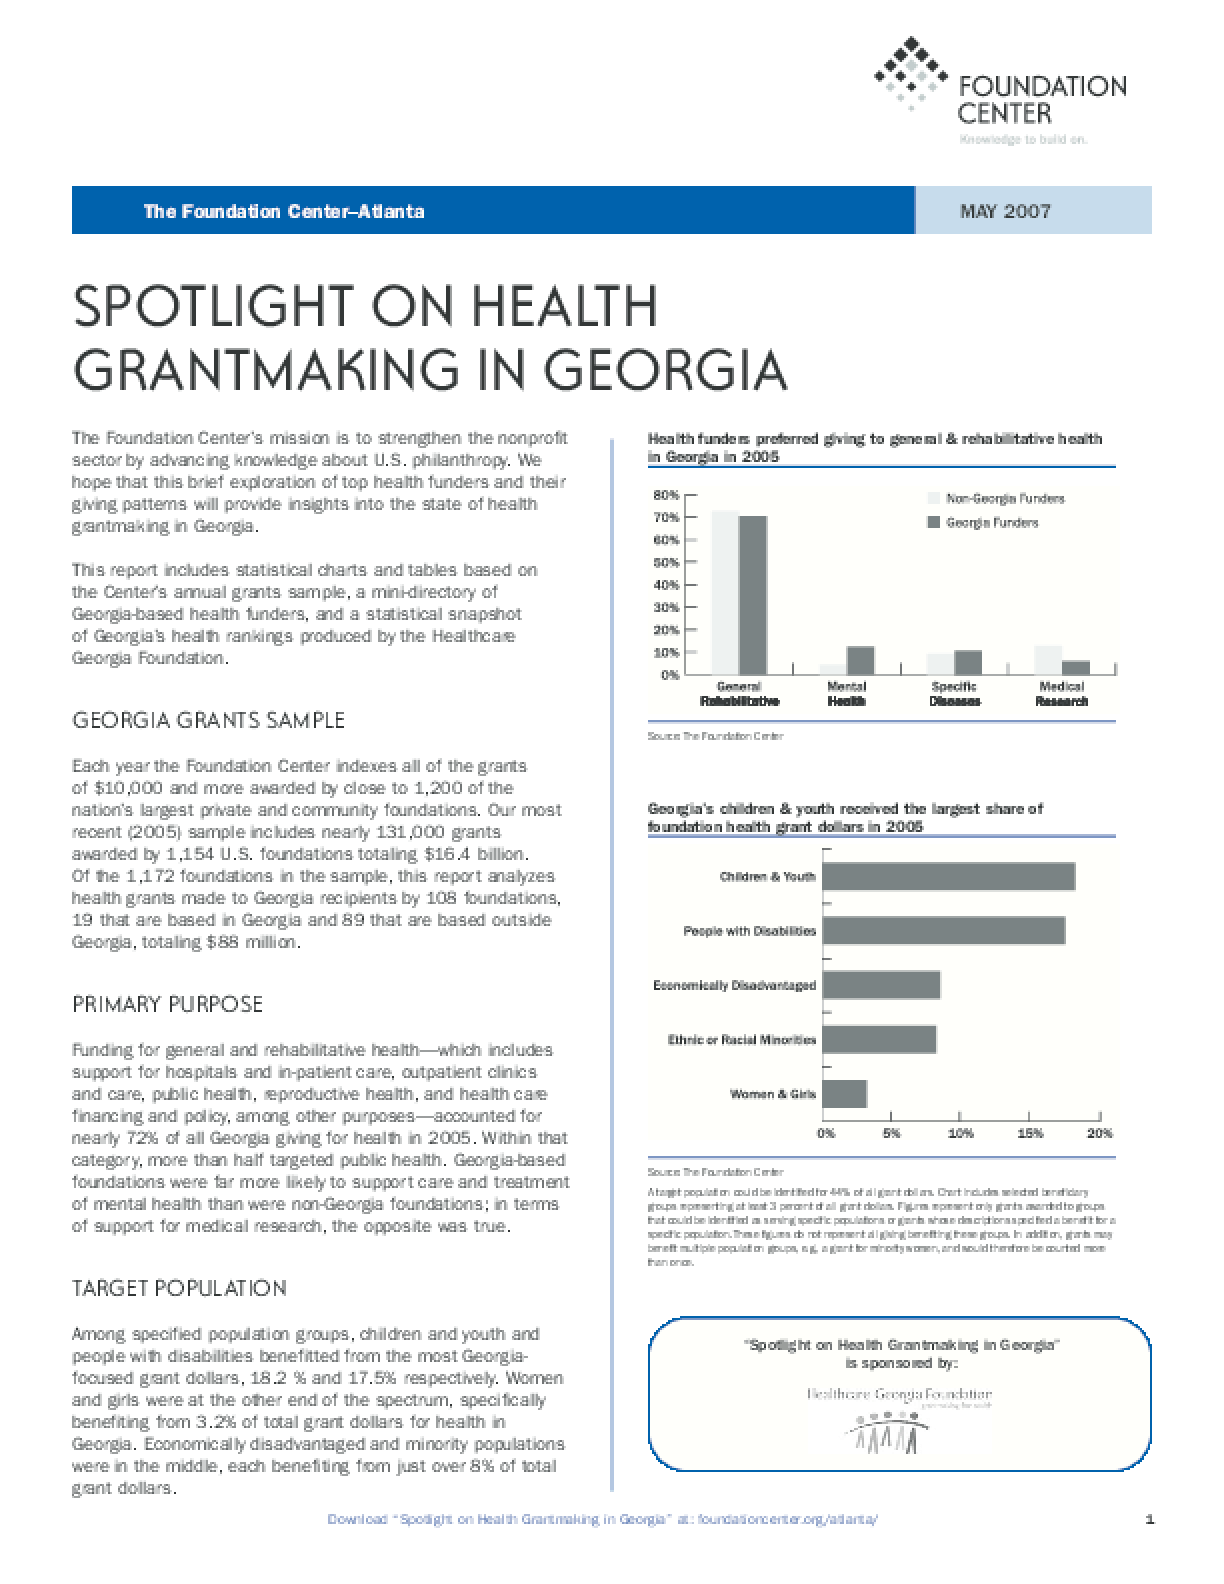 Spotlight on Health Grantmaking in Georgia 2007